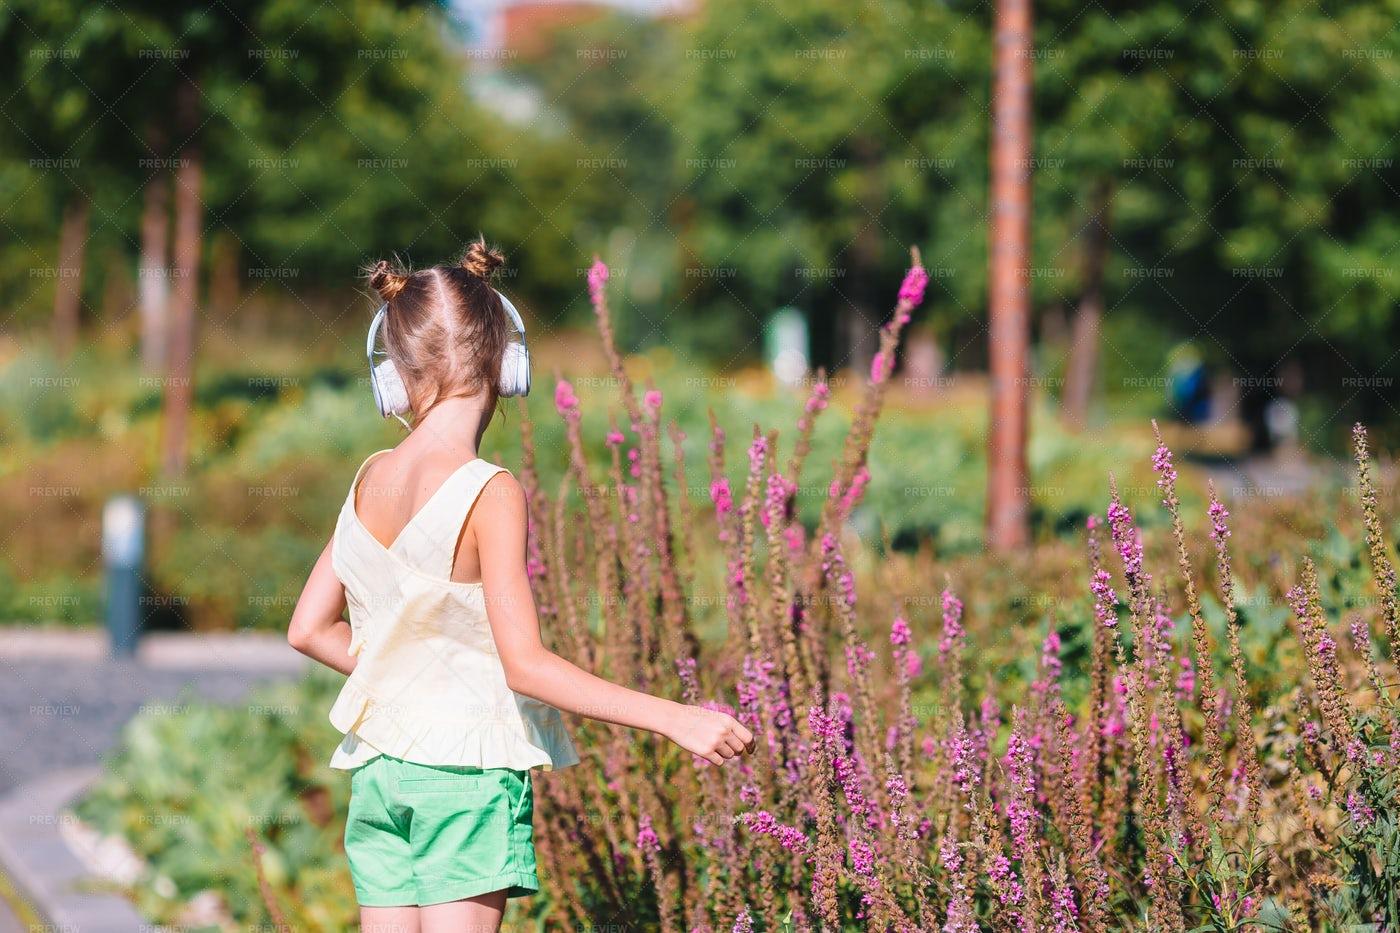 Girl Dancing To Music: Stock Photos